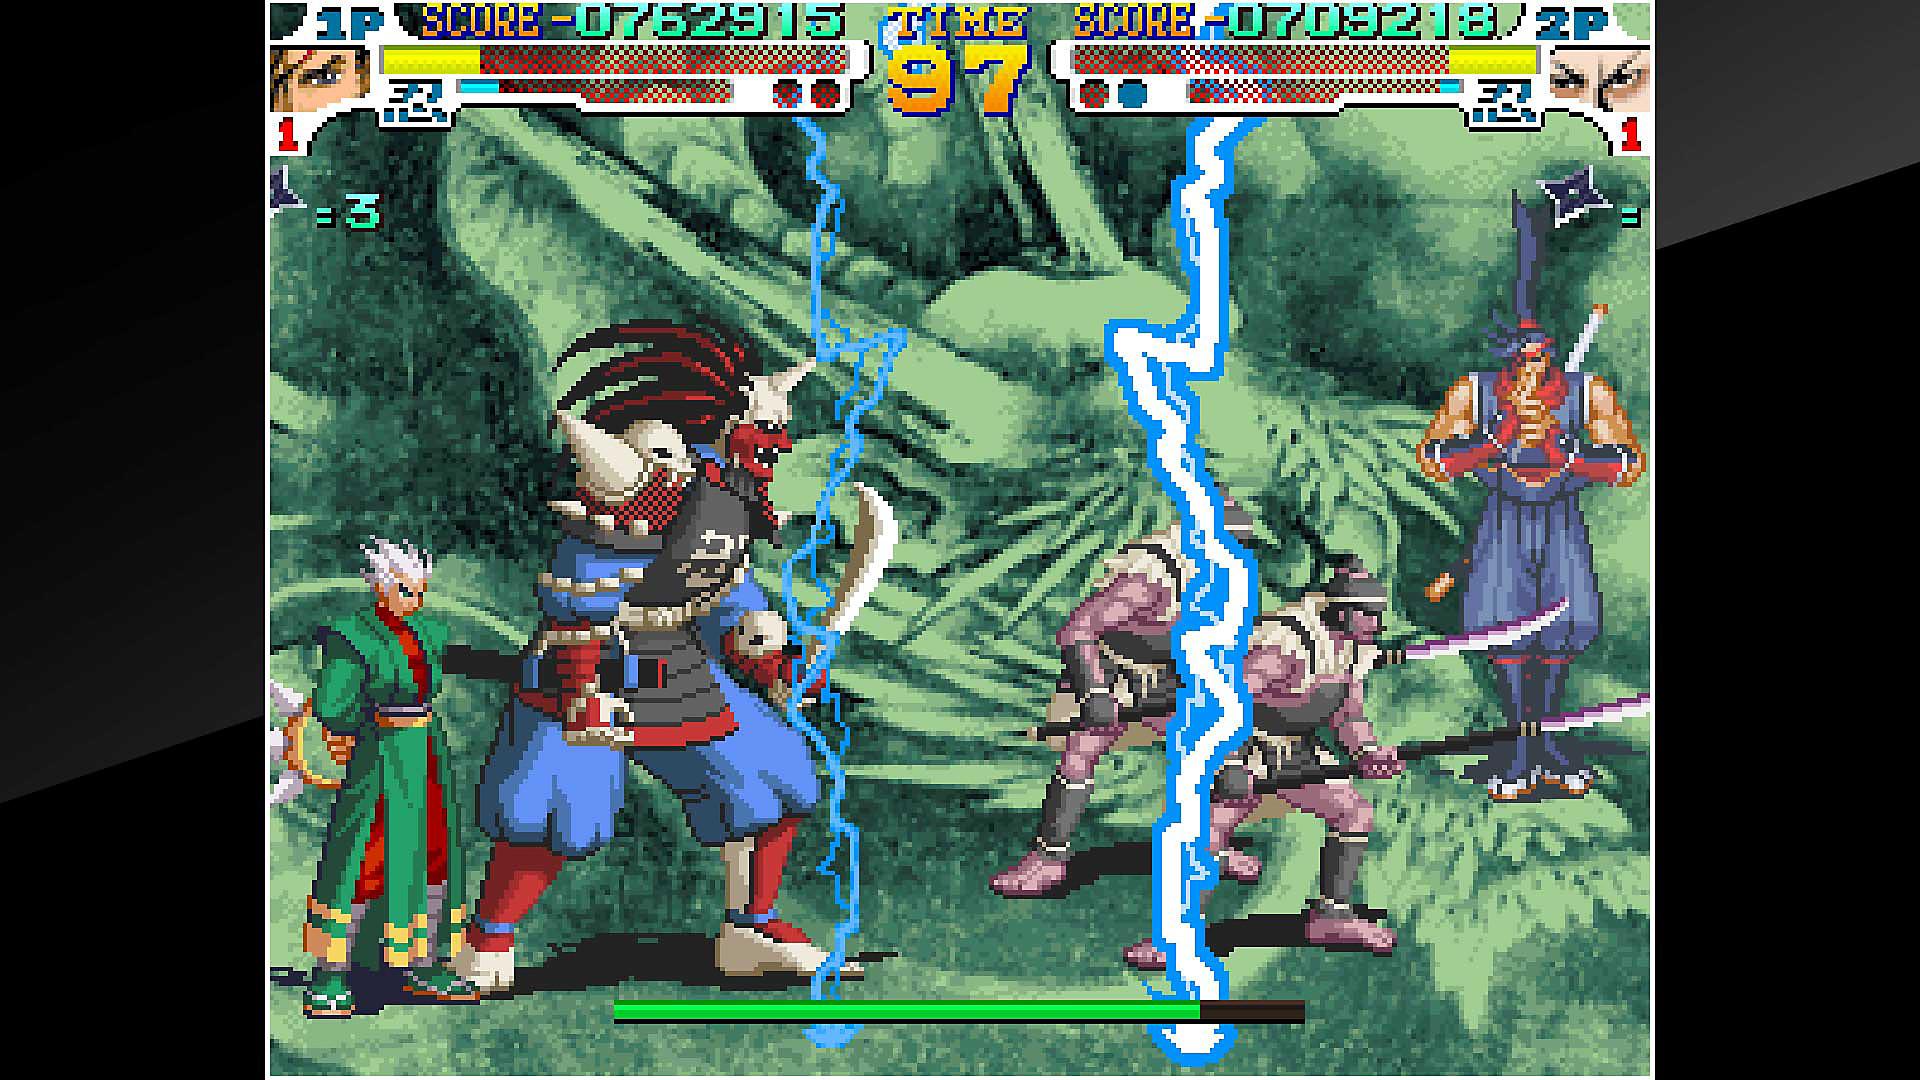 ACA NEOGEO SENGOKU 3 Game | PS4 - PlayStation